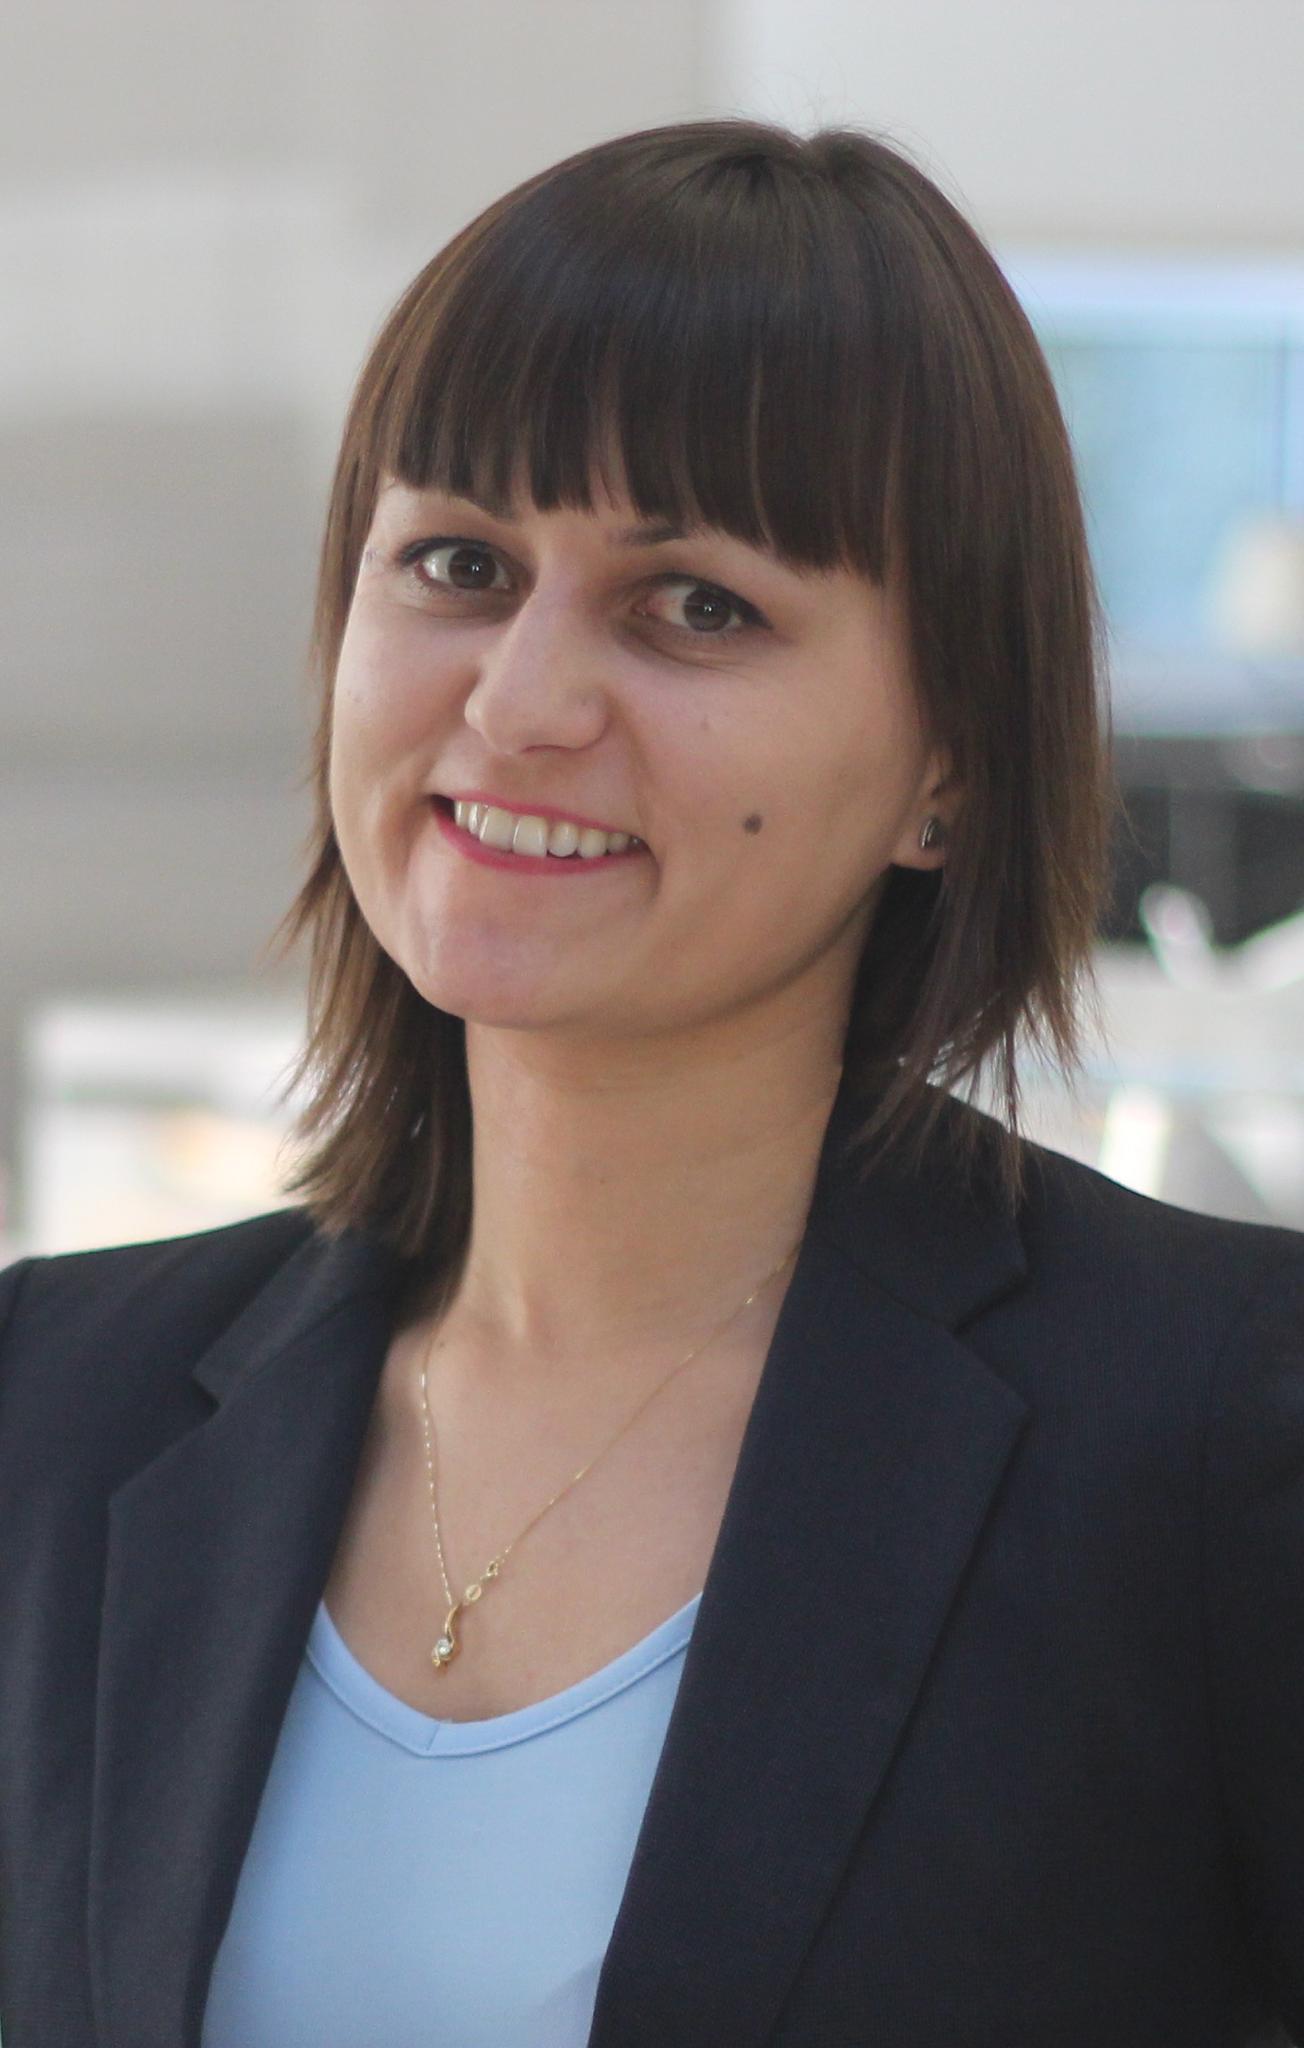 Tsvetelina (Lina) Churalska